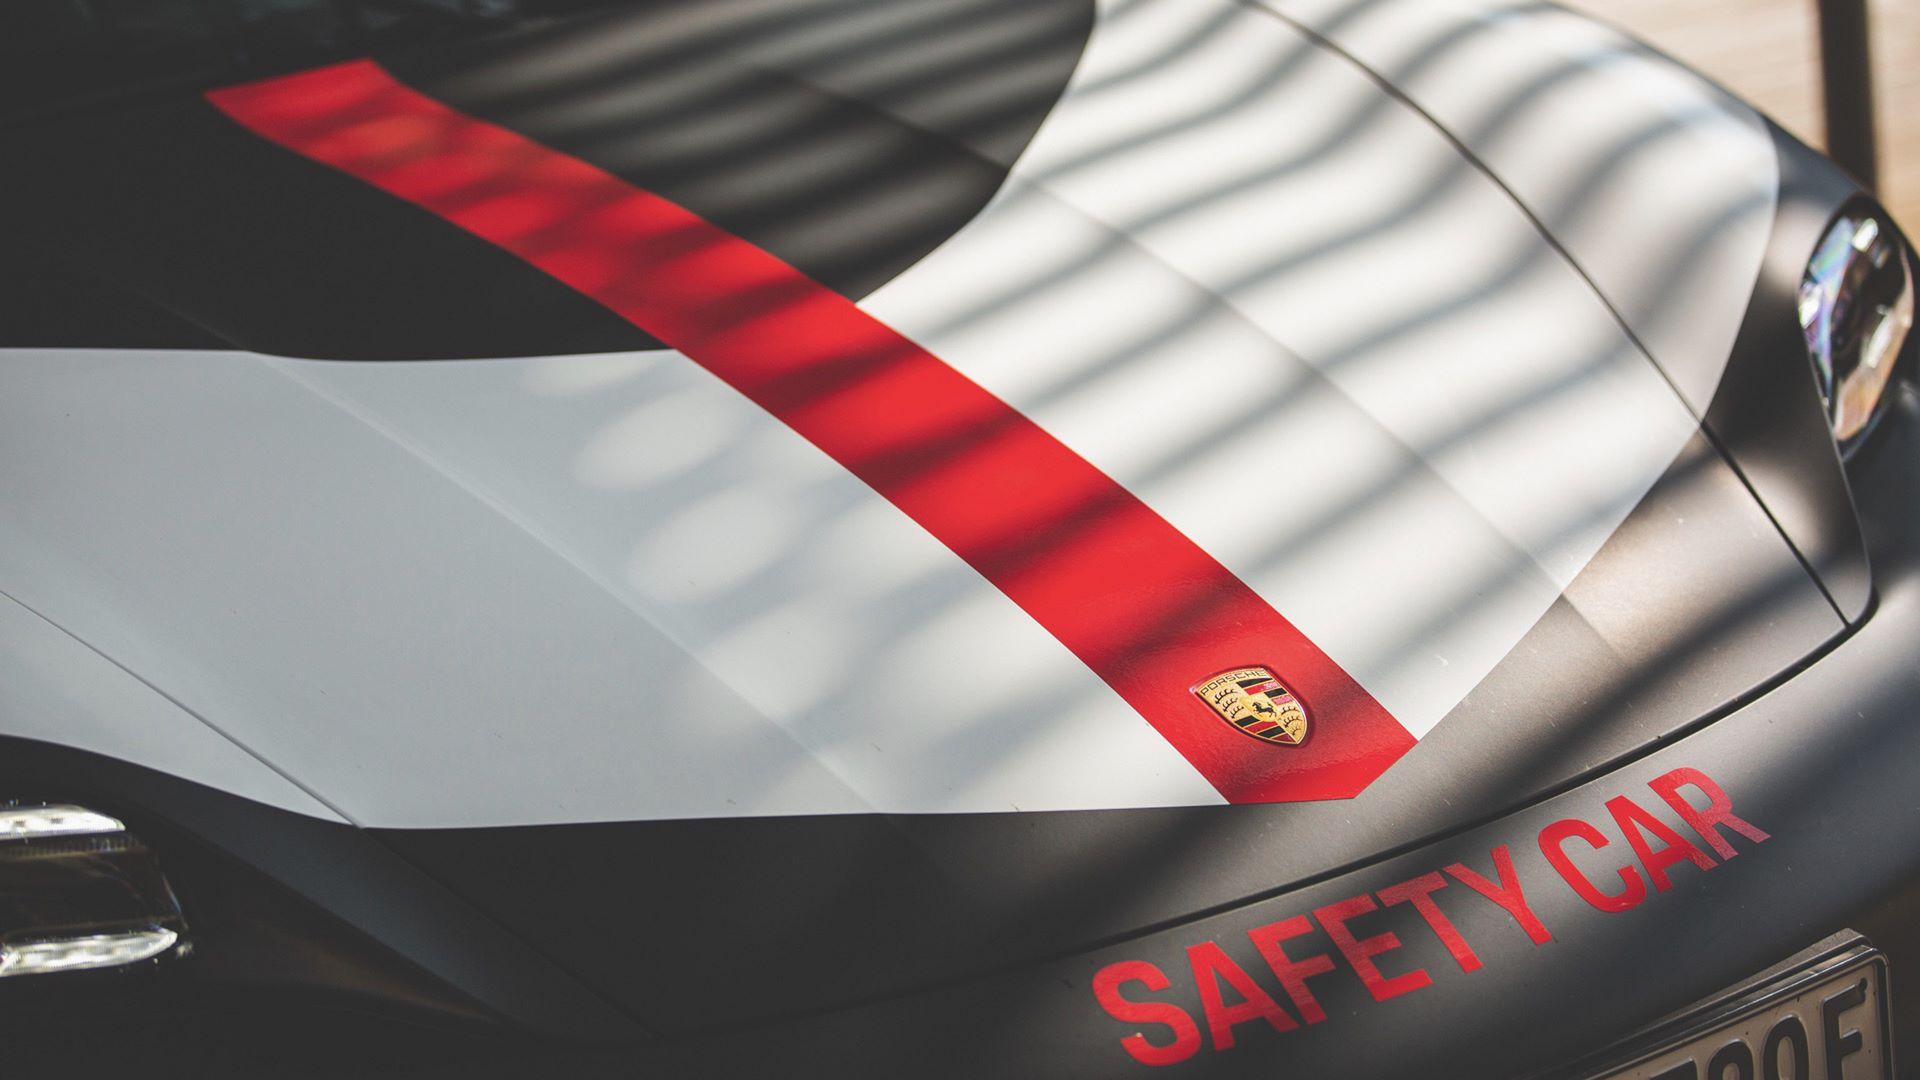 Porsche-Taycan-Turbo-safety-car-Le-Mans-2020-11